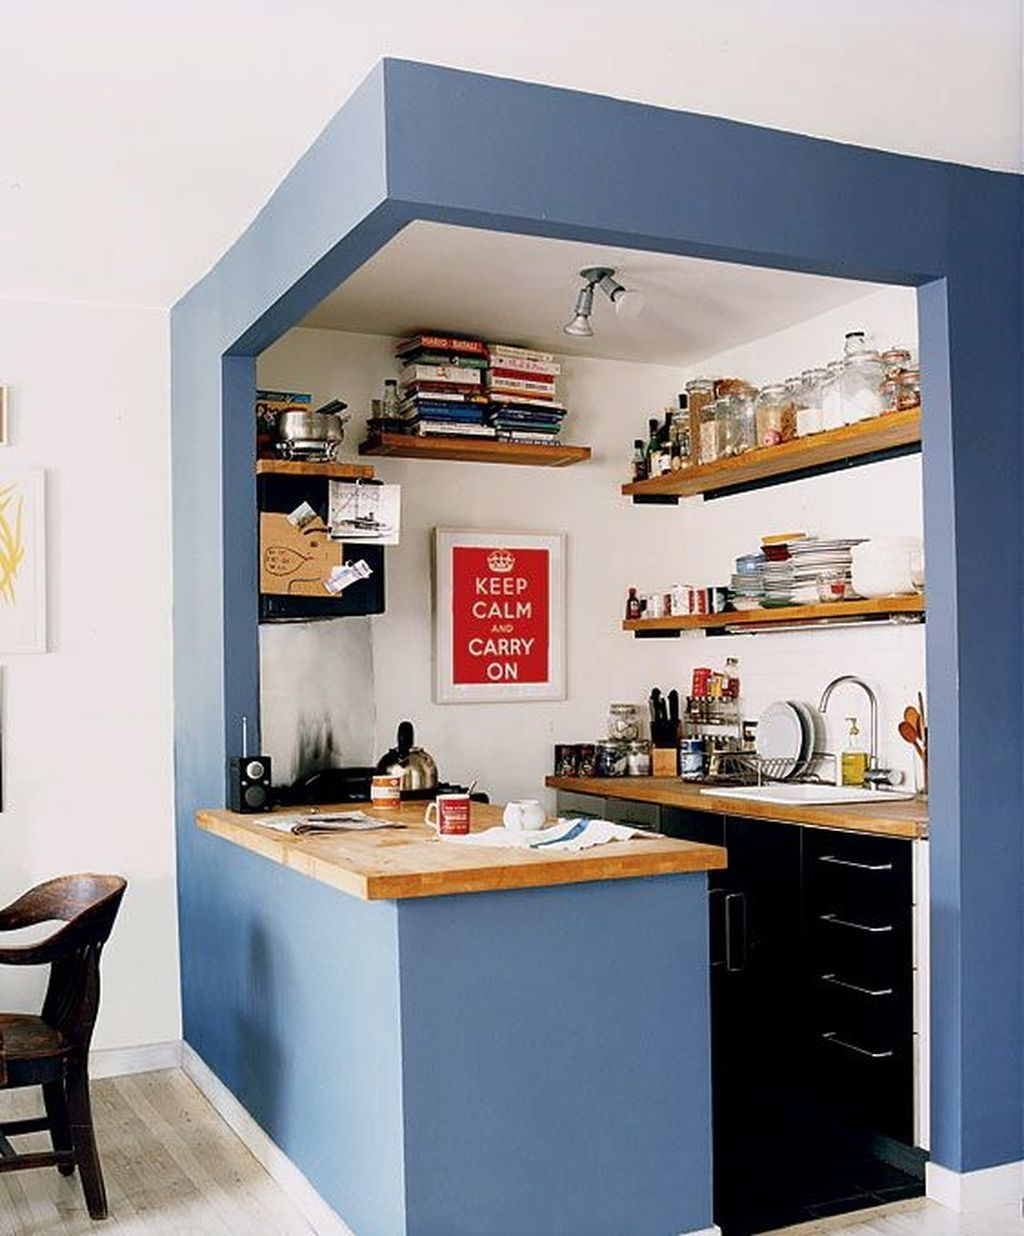 relaxing apartment kitchen design ideas kitchen pinterest